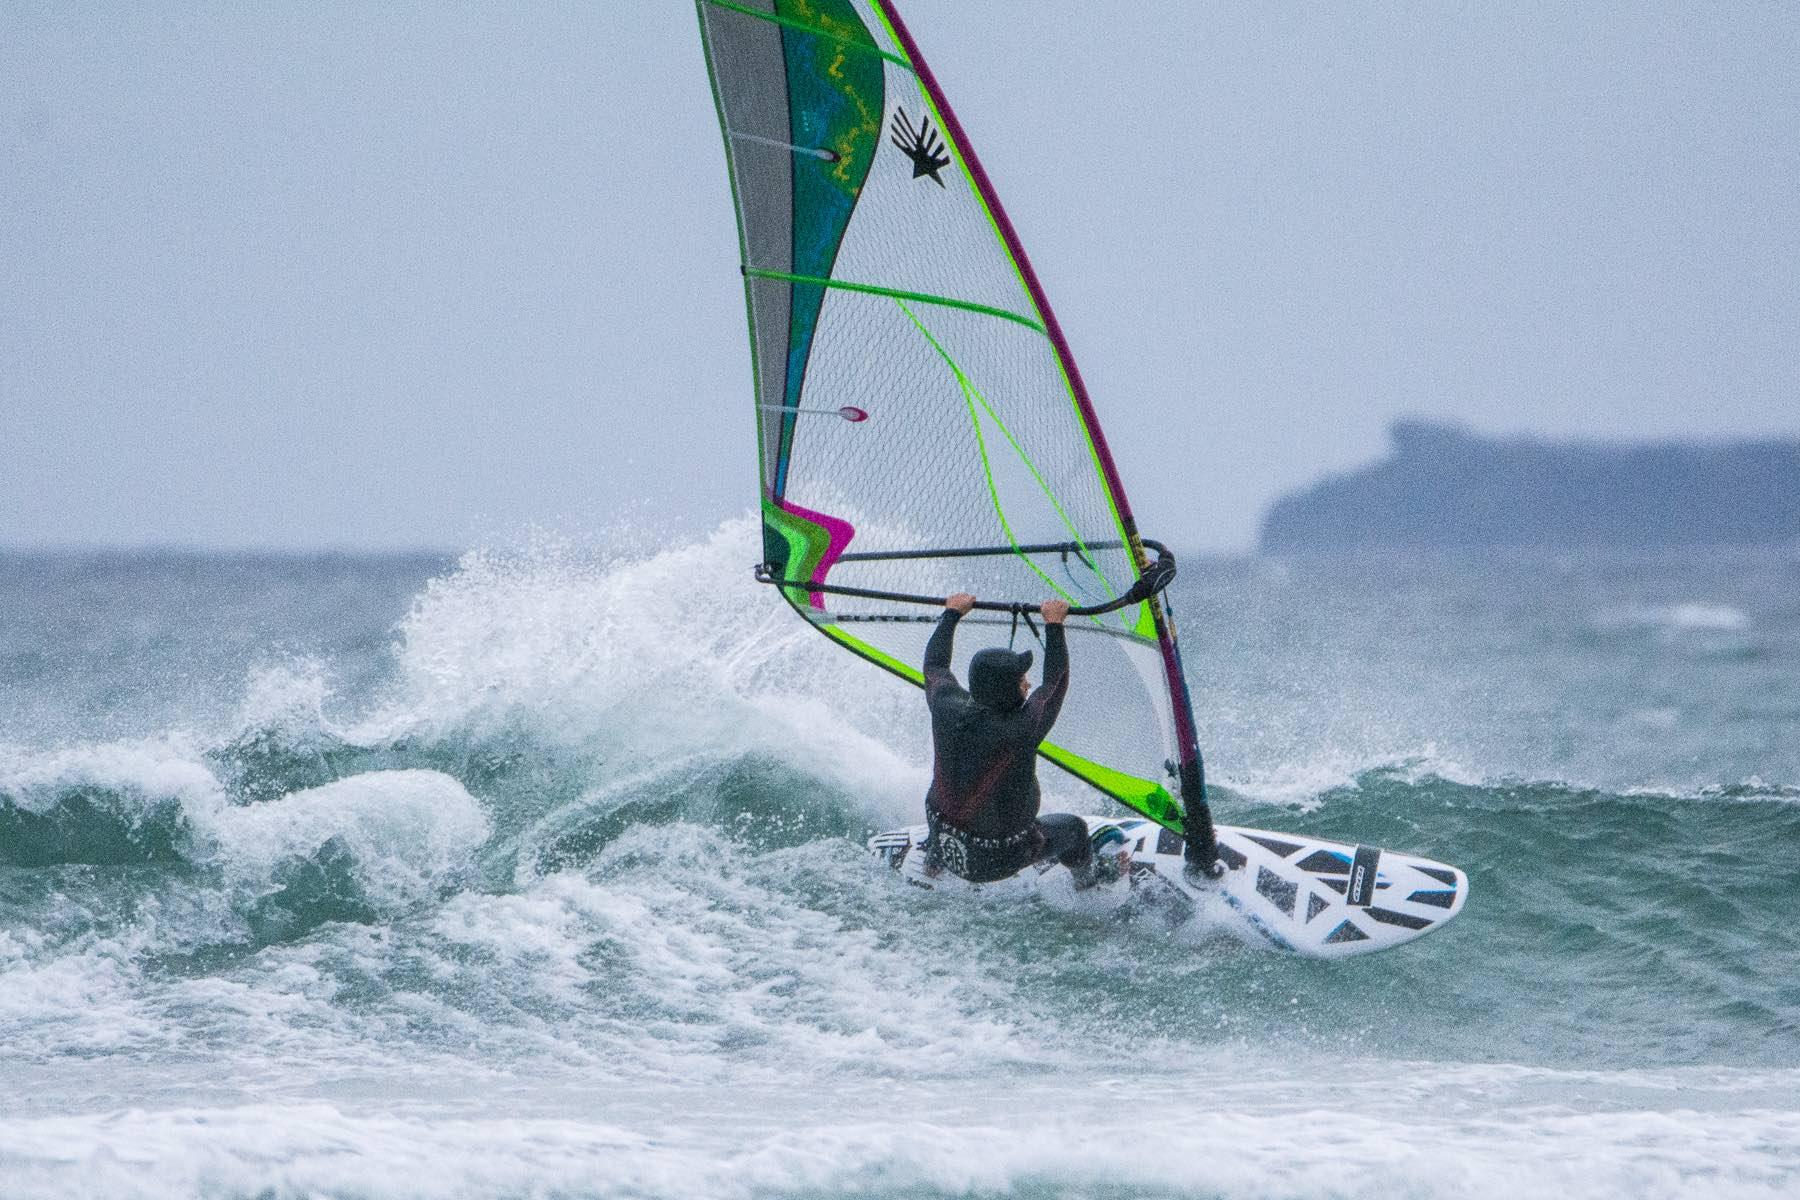 Gijs van Ierssel Windsurfing Testimonial Rhodes Ireland Morocco